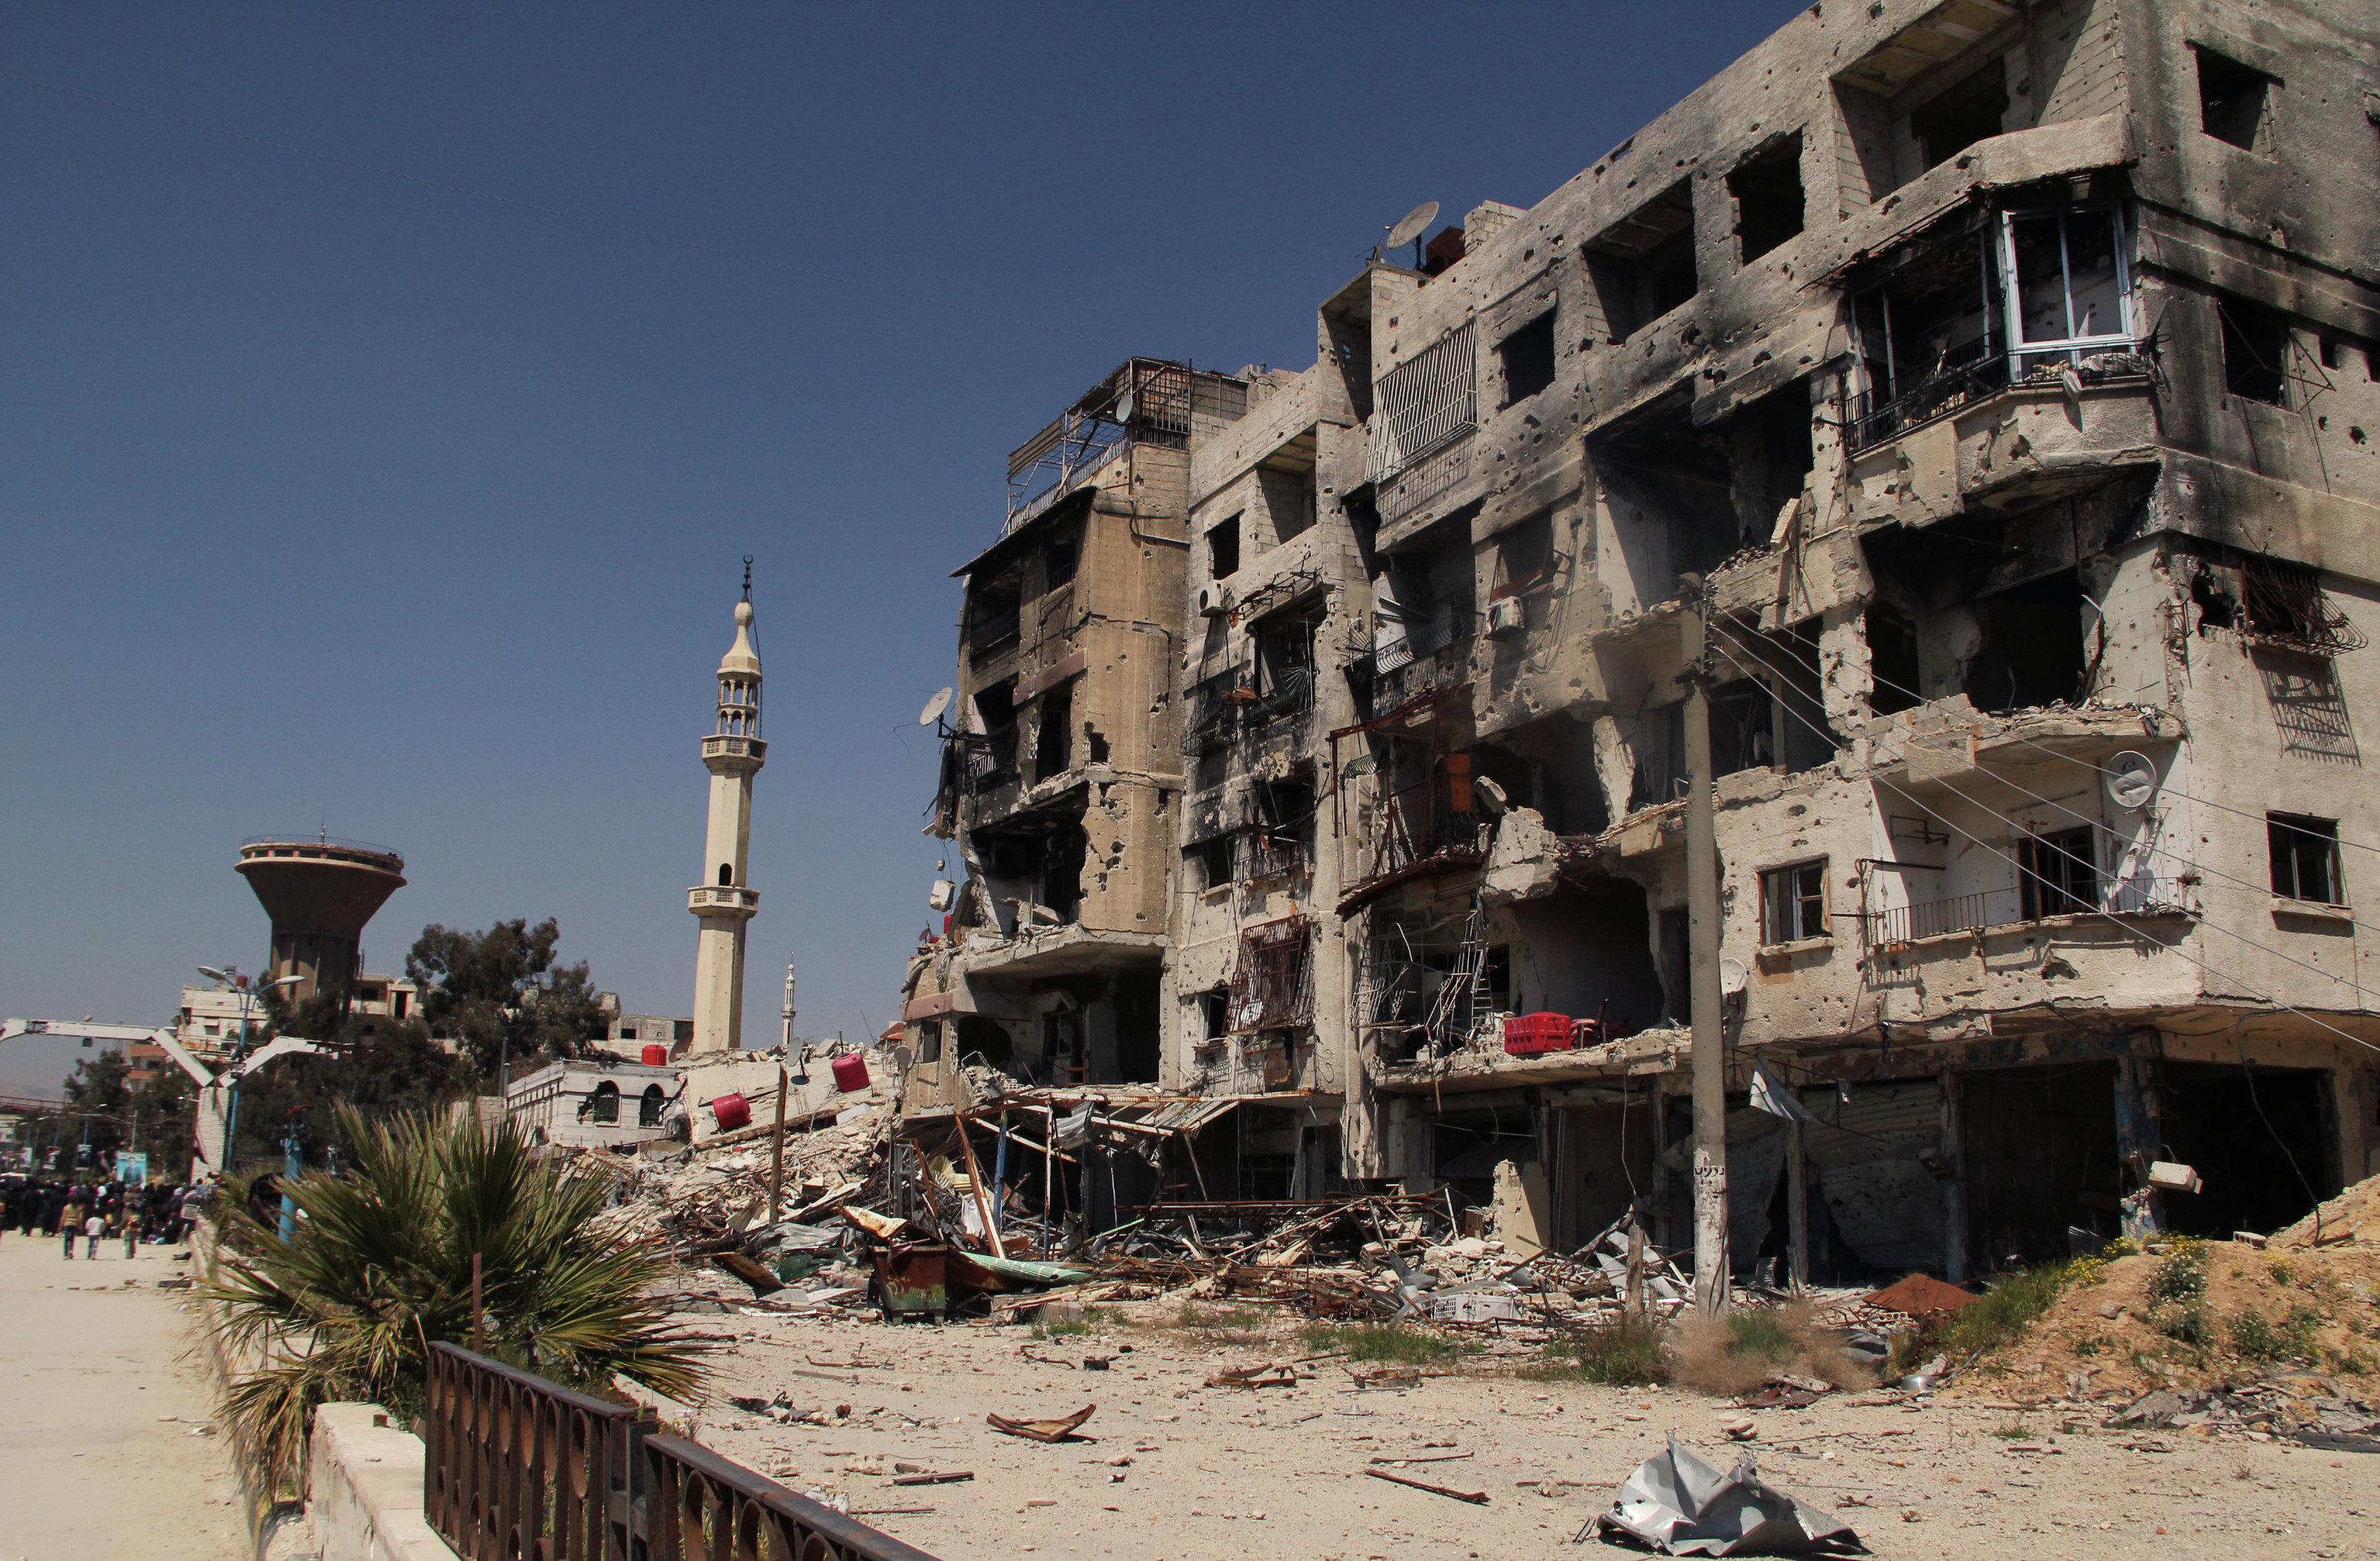 Yarmouk refugee camp in Damascus